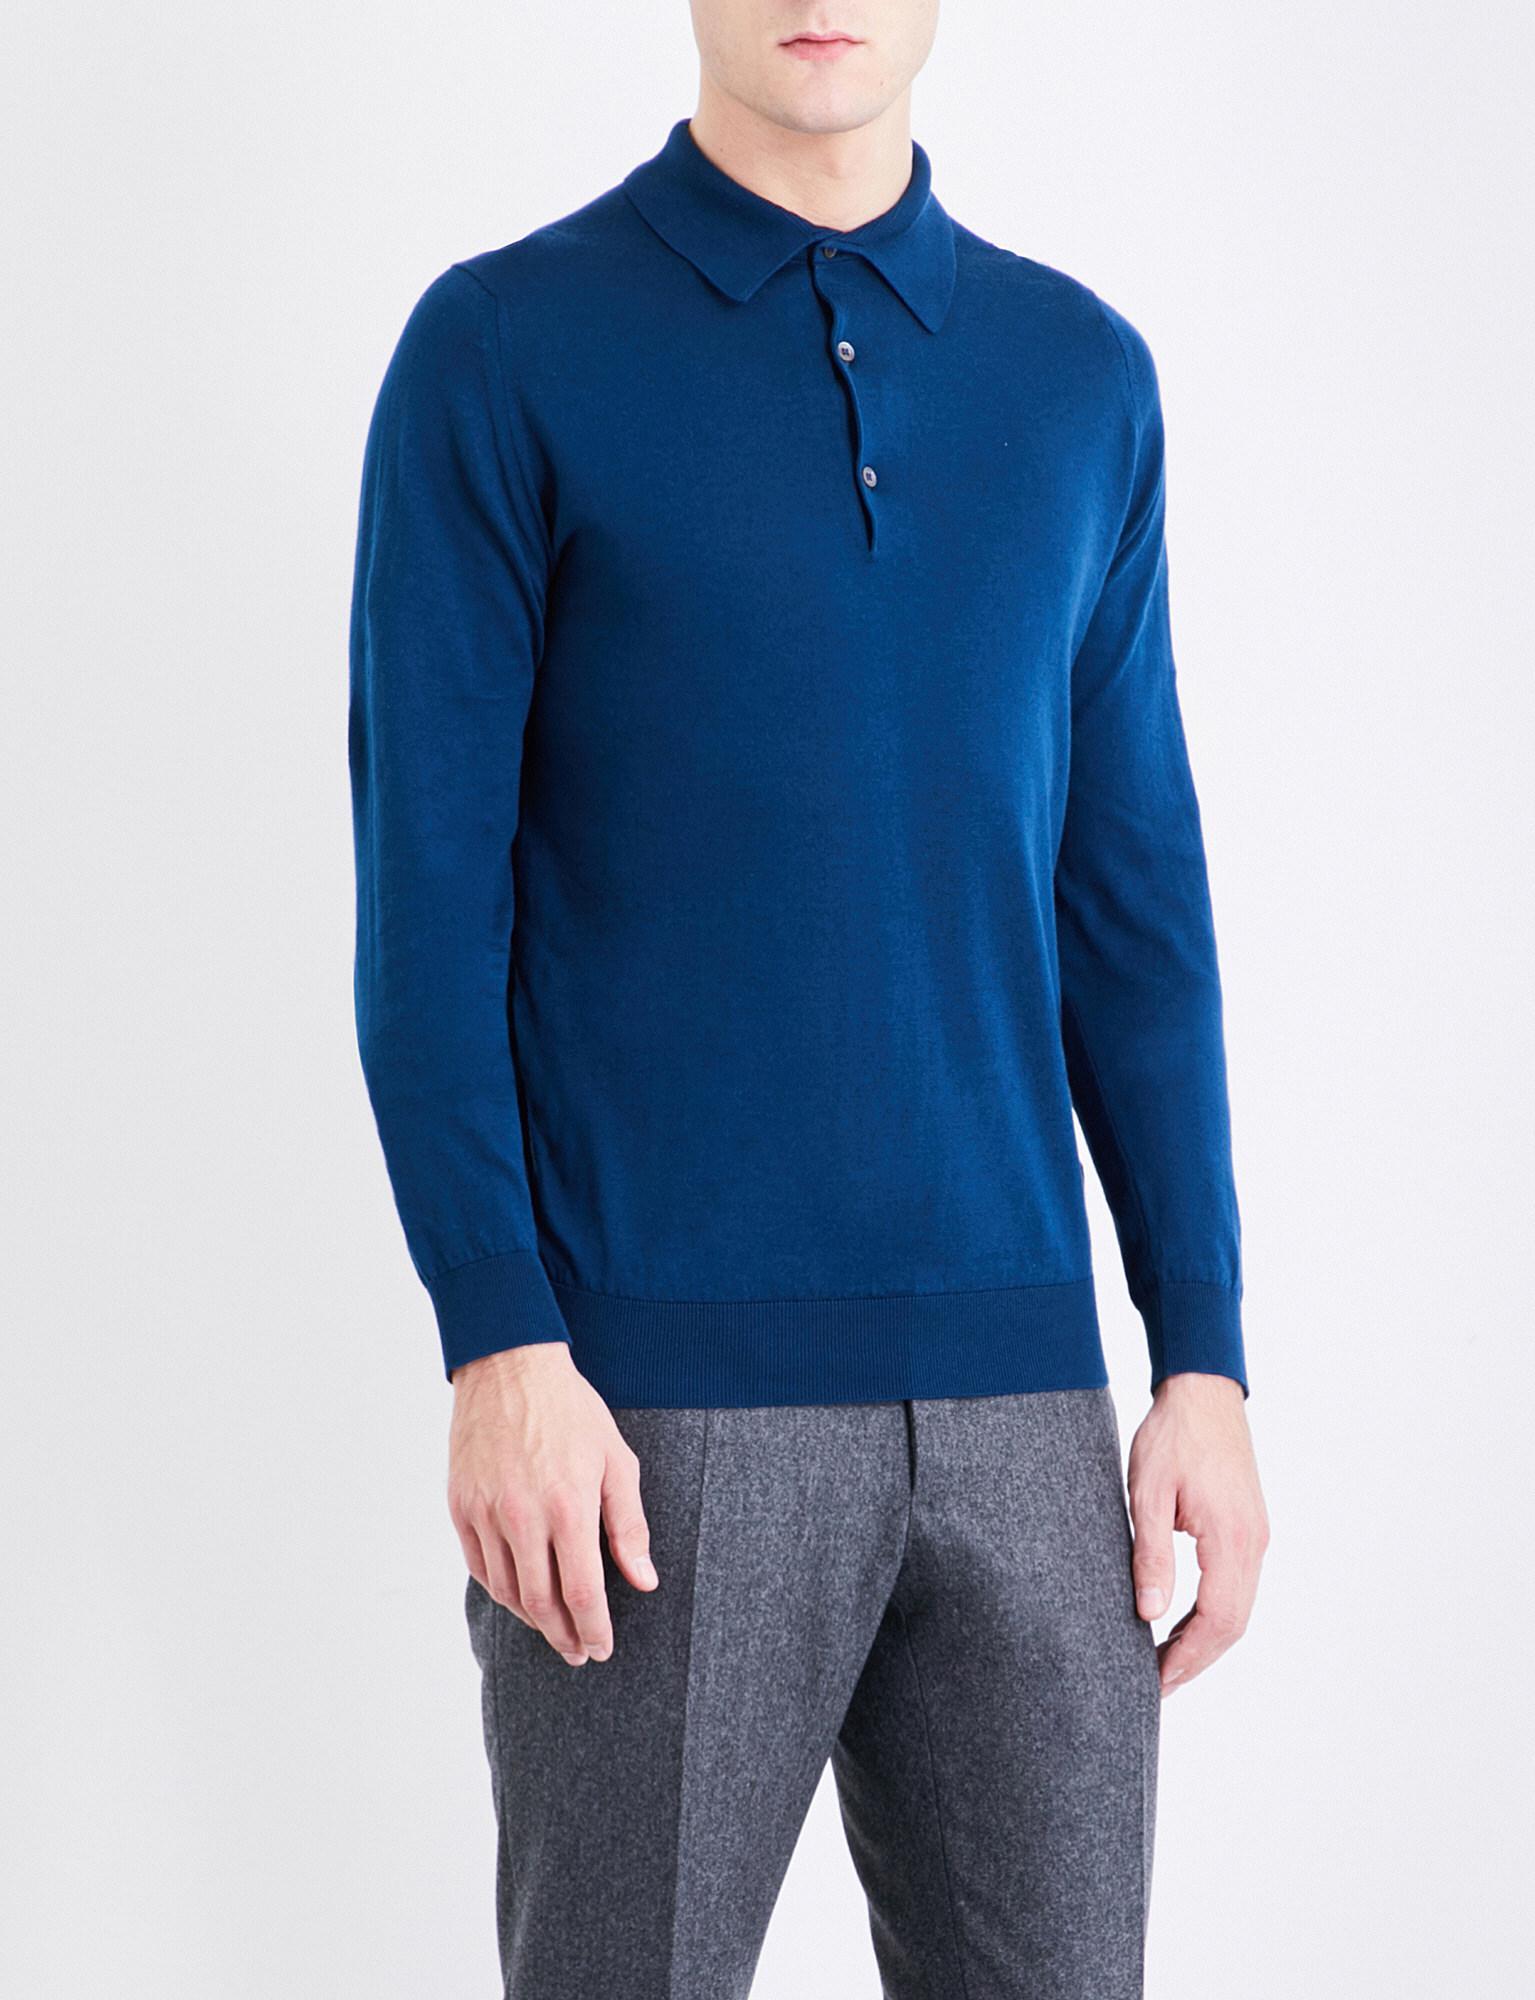 d42cc79d John Smedley Bradwell Knitted Jumper in Blue for Men - Lyst